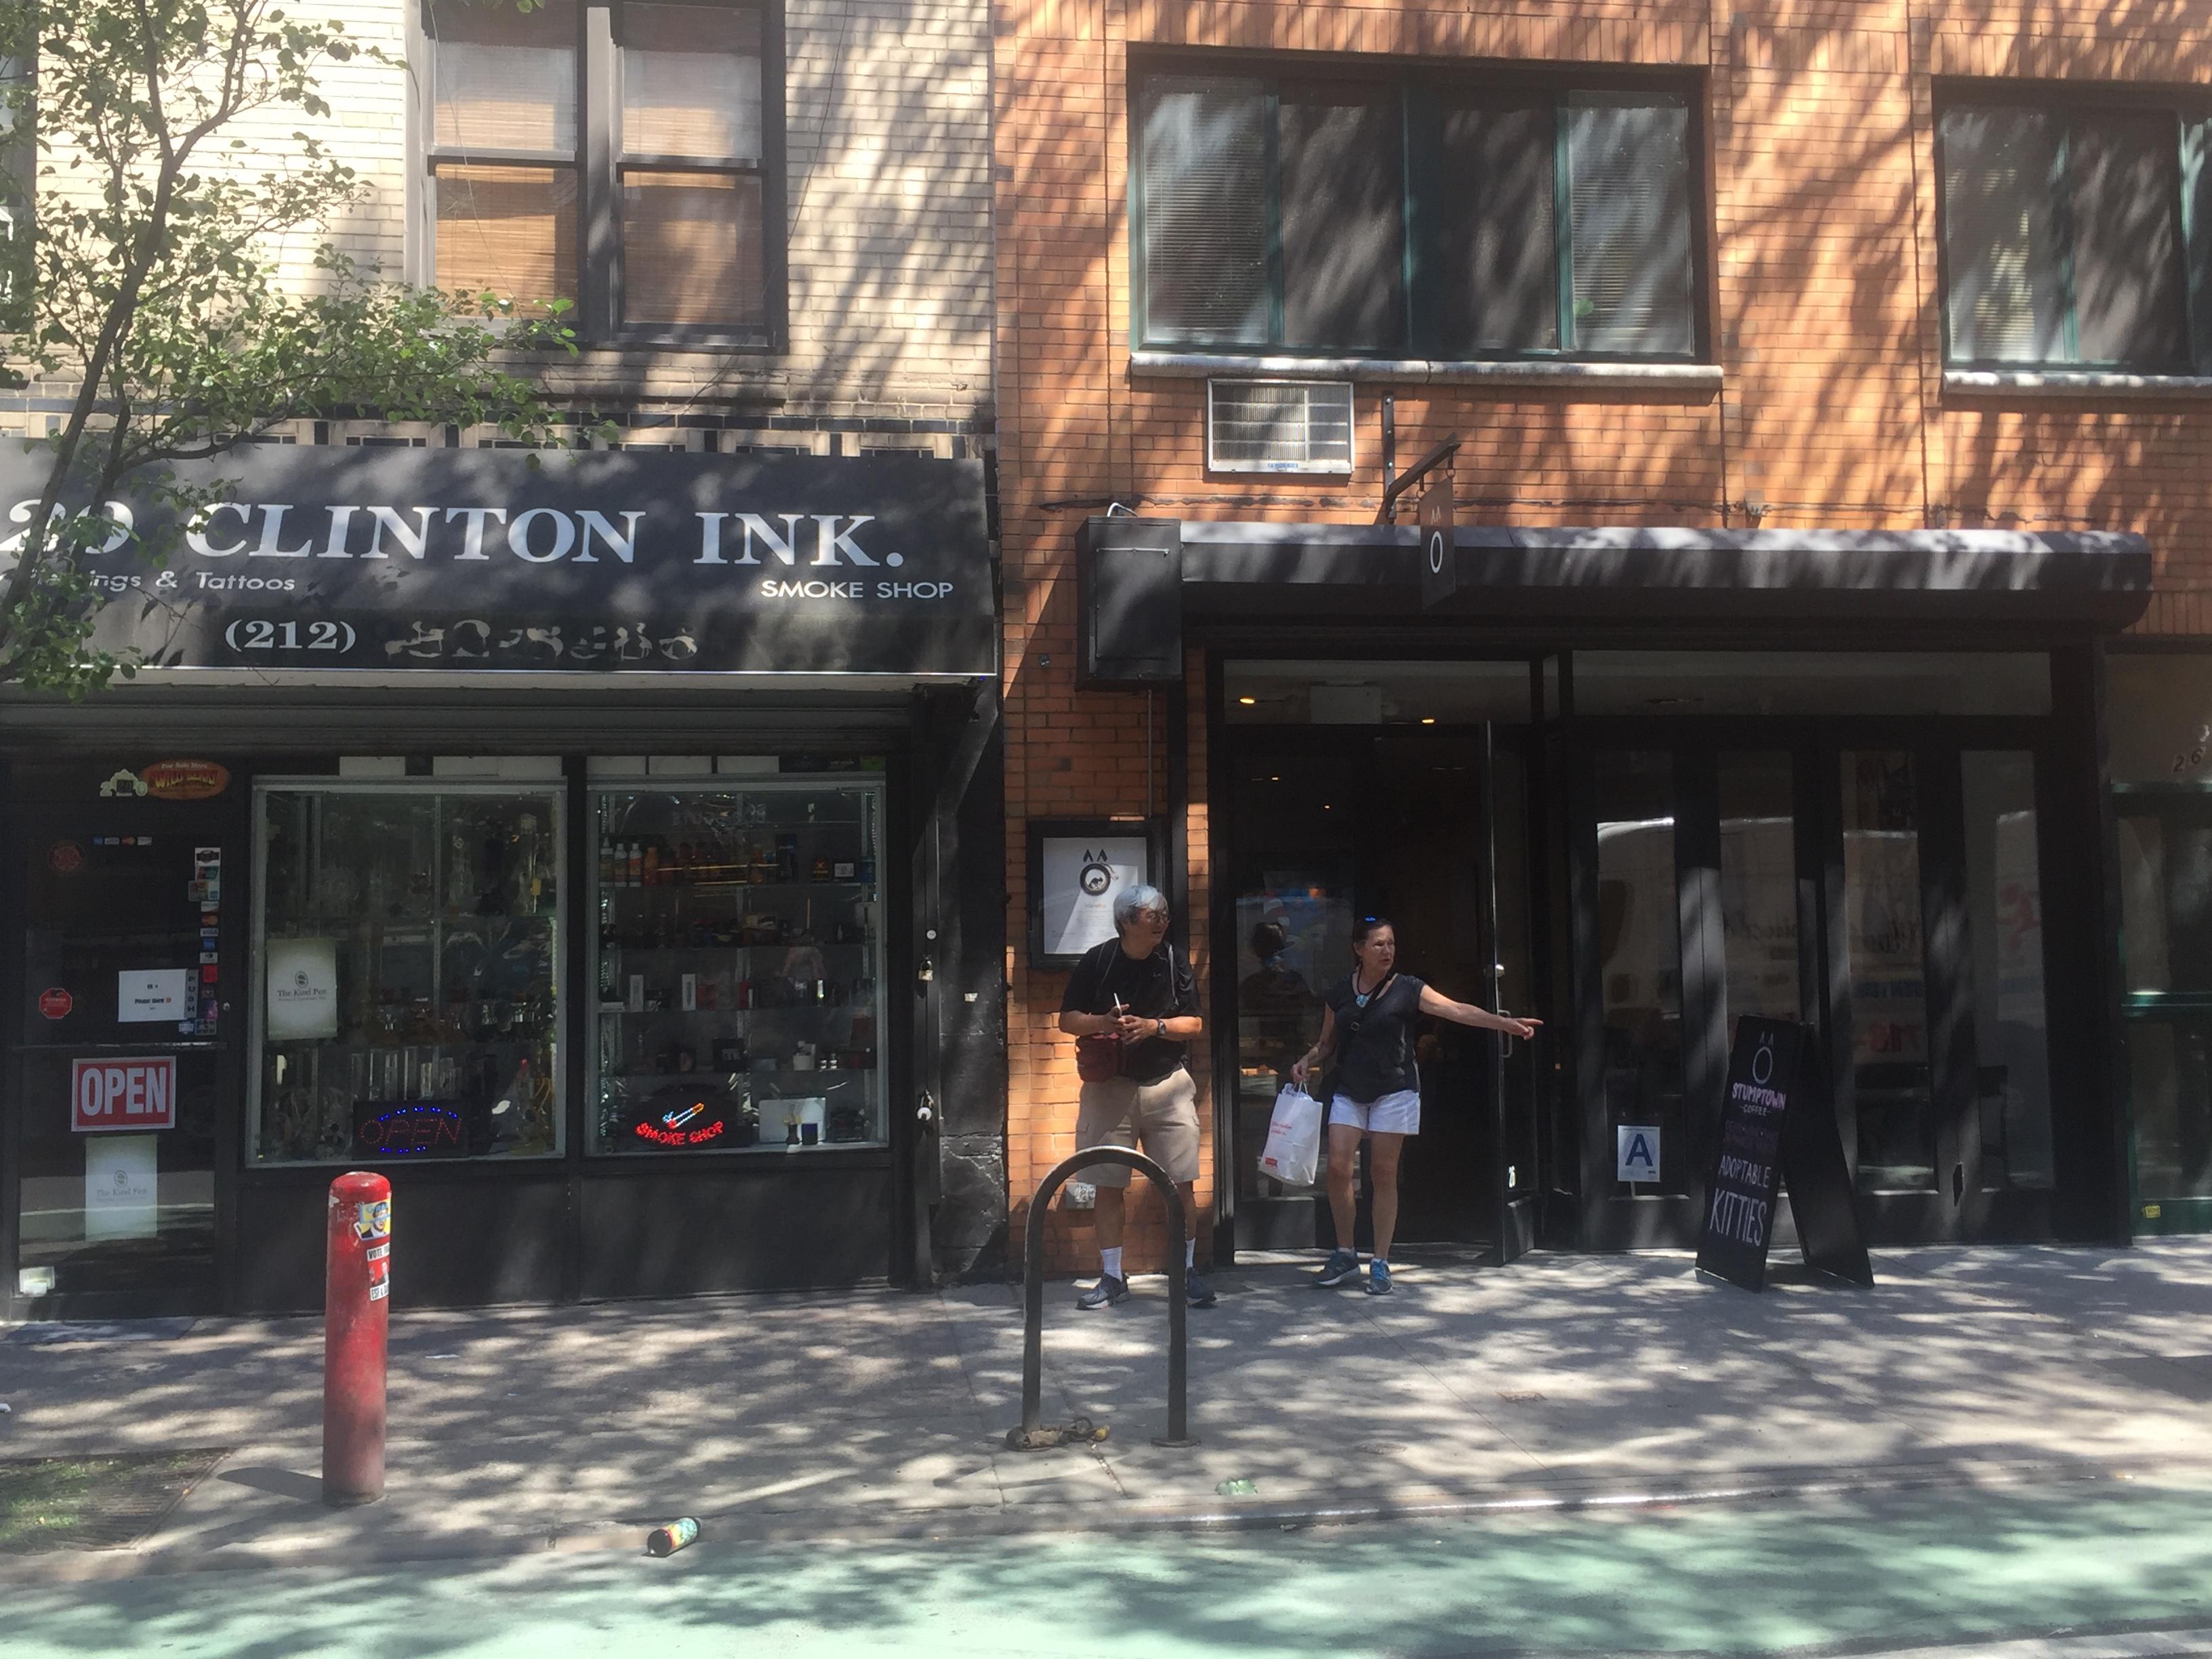 Clinton Ink next to Koneko Cat Cafe (Photo by Kavitha Surana)